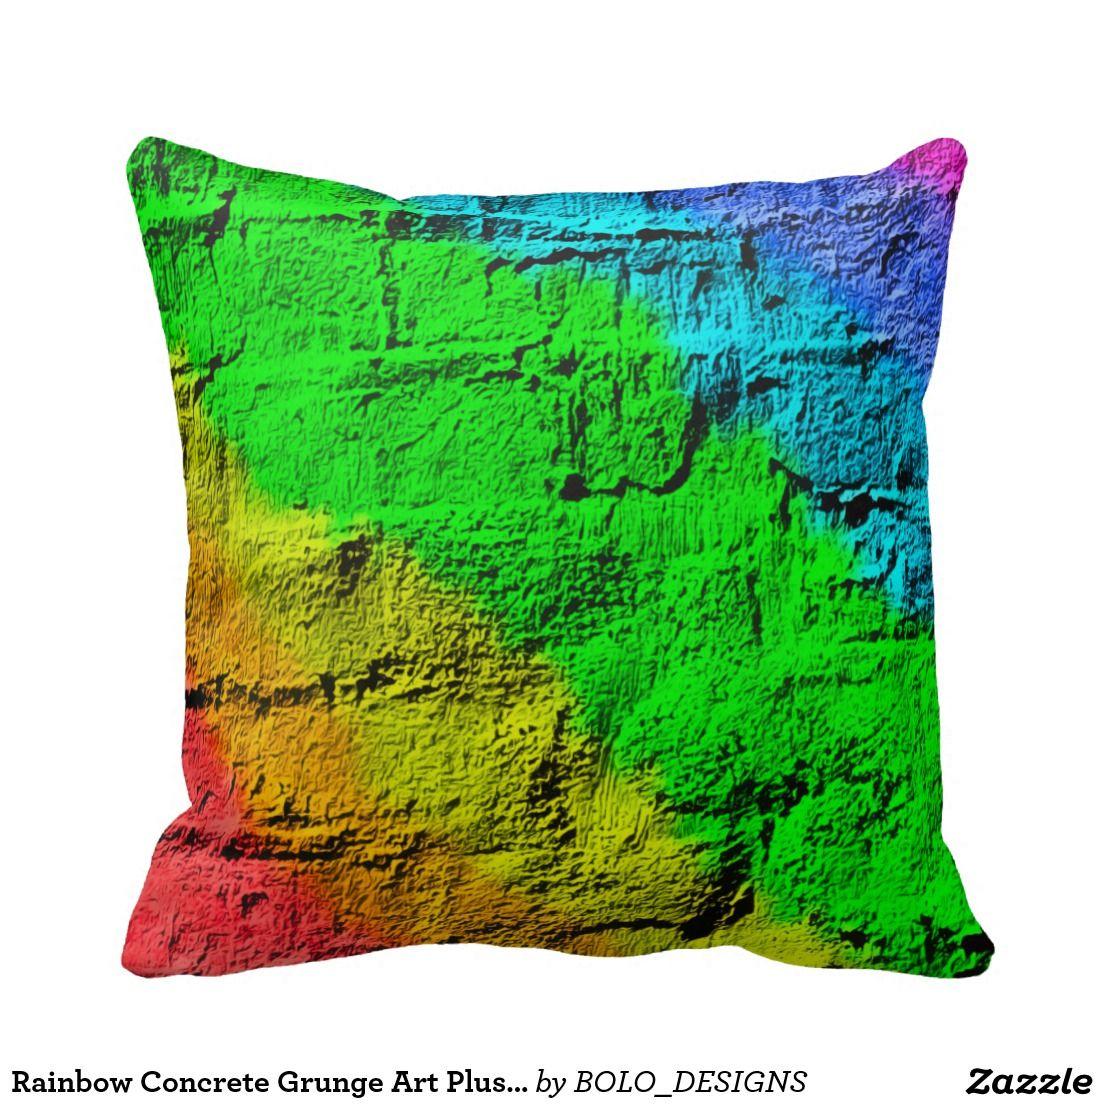 Rainbow concrete grunge art plush throw pillow art grunge art and